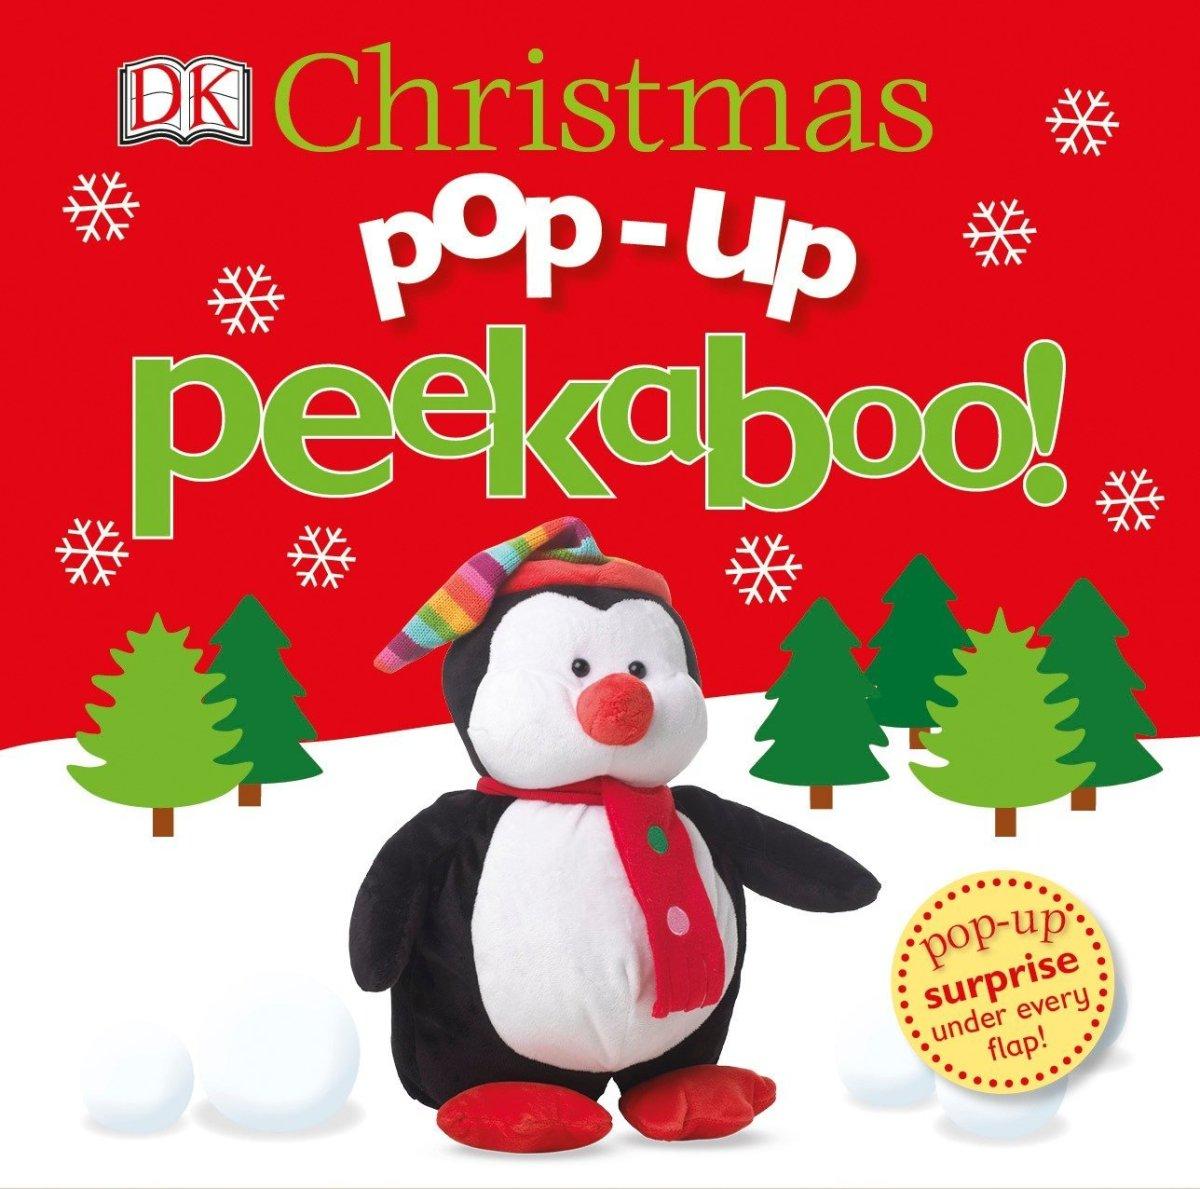 Pop-up Peekaboo Christmas